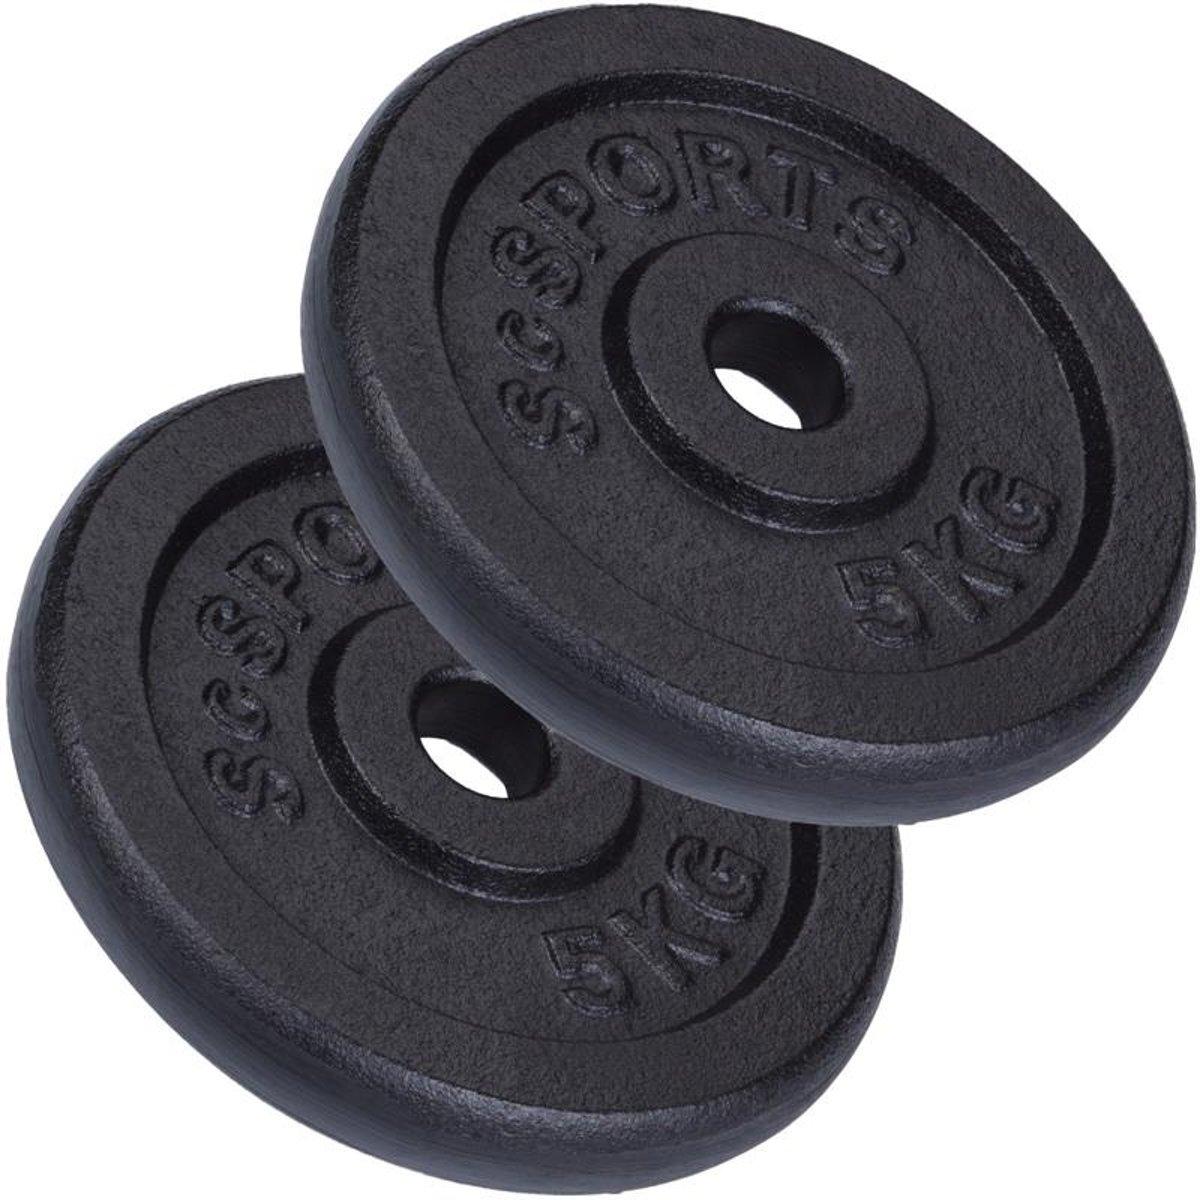 ScSPORTS® 10 kg Halterschijvenset gietijzer 30 mm 2x5 kg kopen